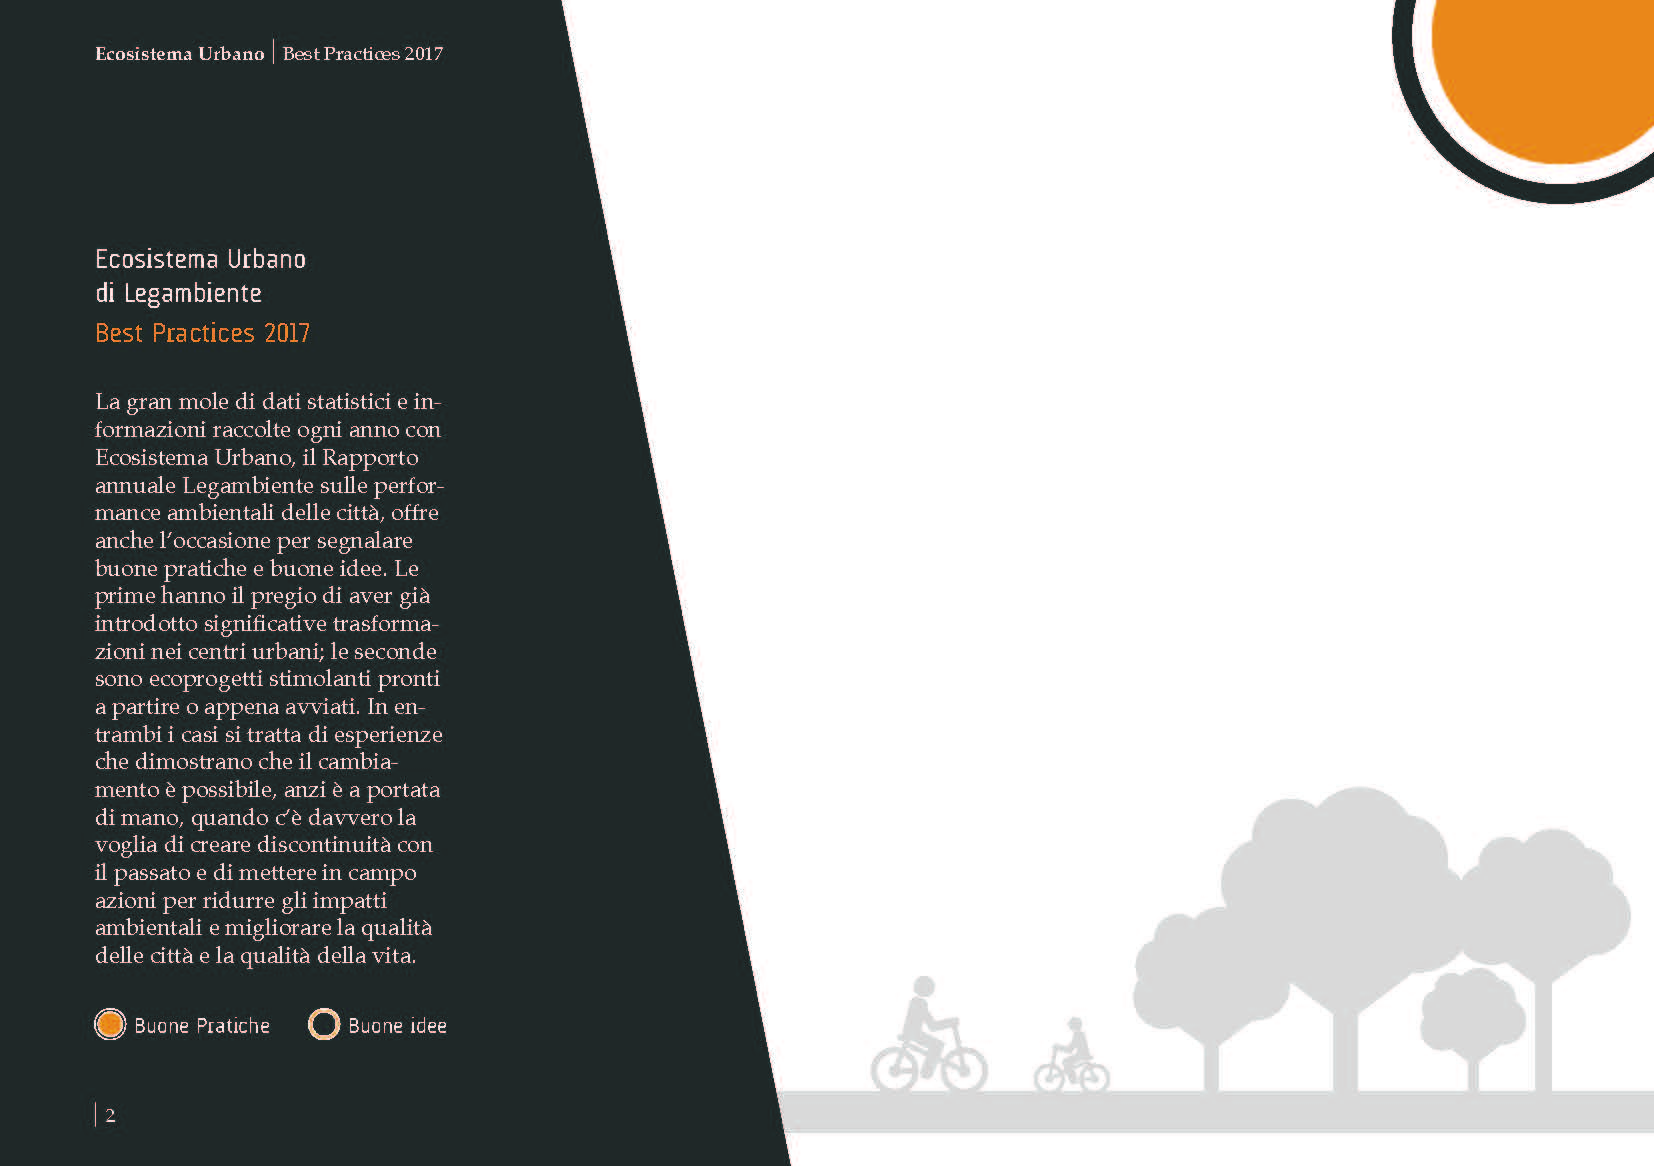 best_practices_ecosistema_urbano_2017_Pagina_02